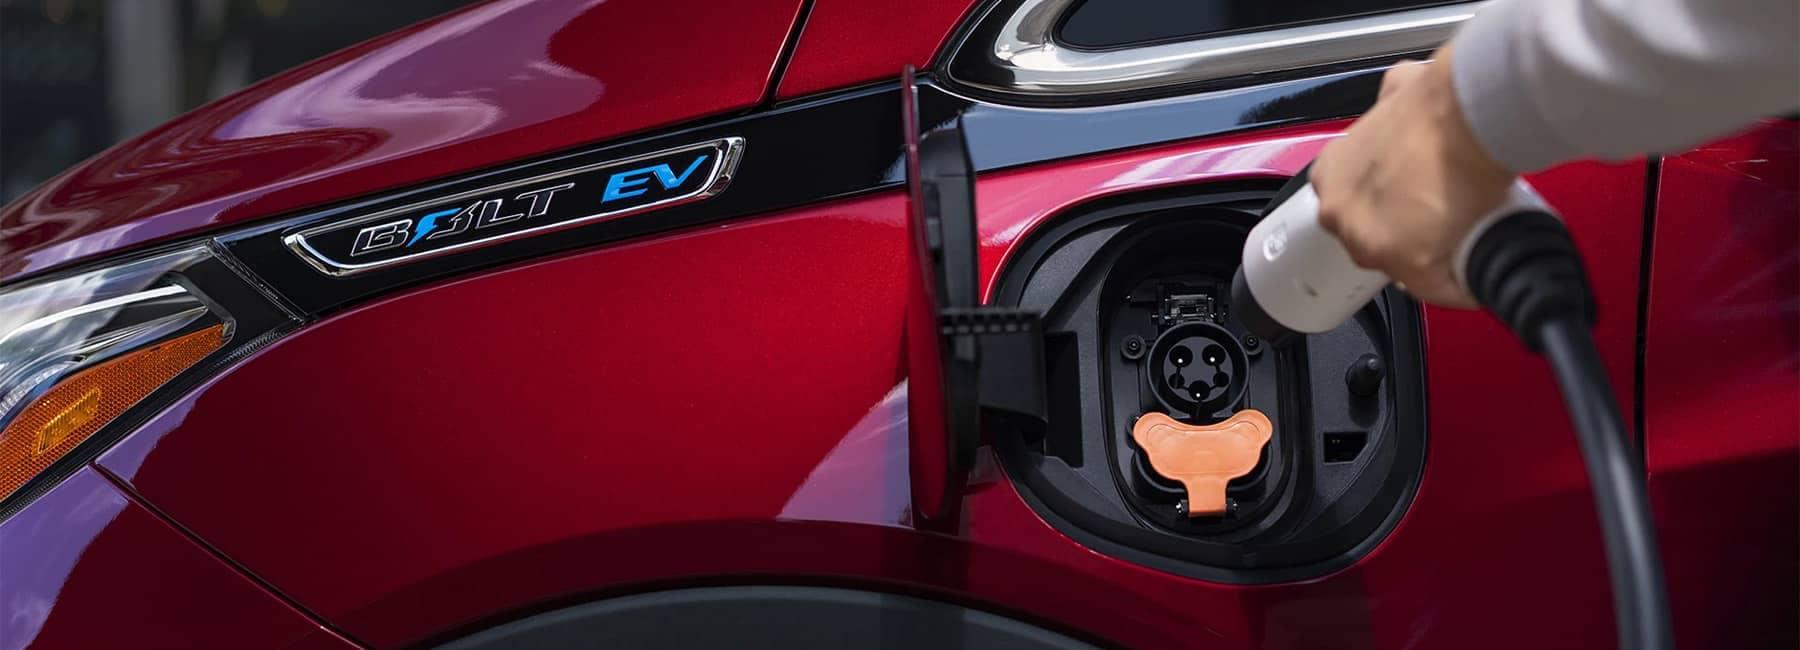 2020 Bolt EV Electric Car Charging Port View